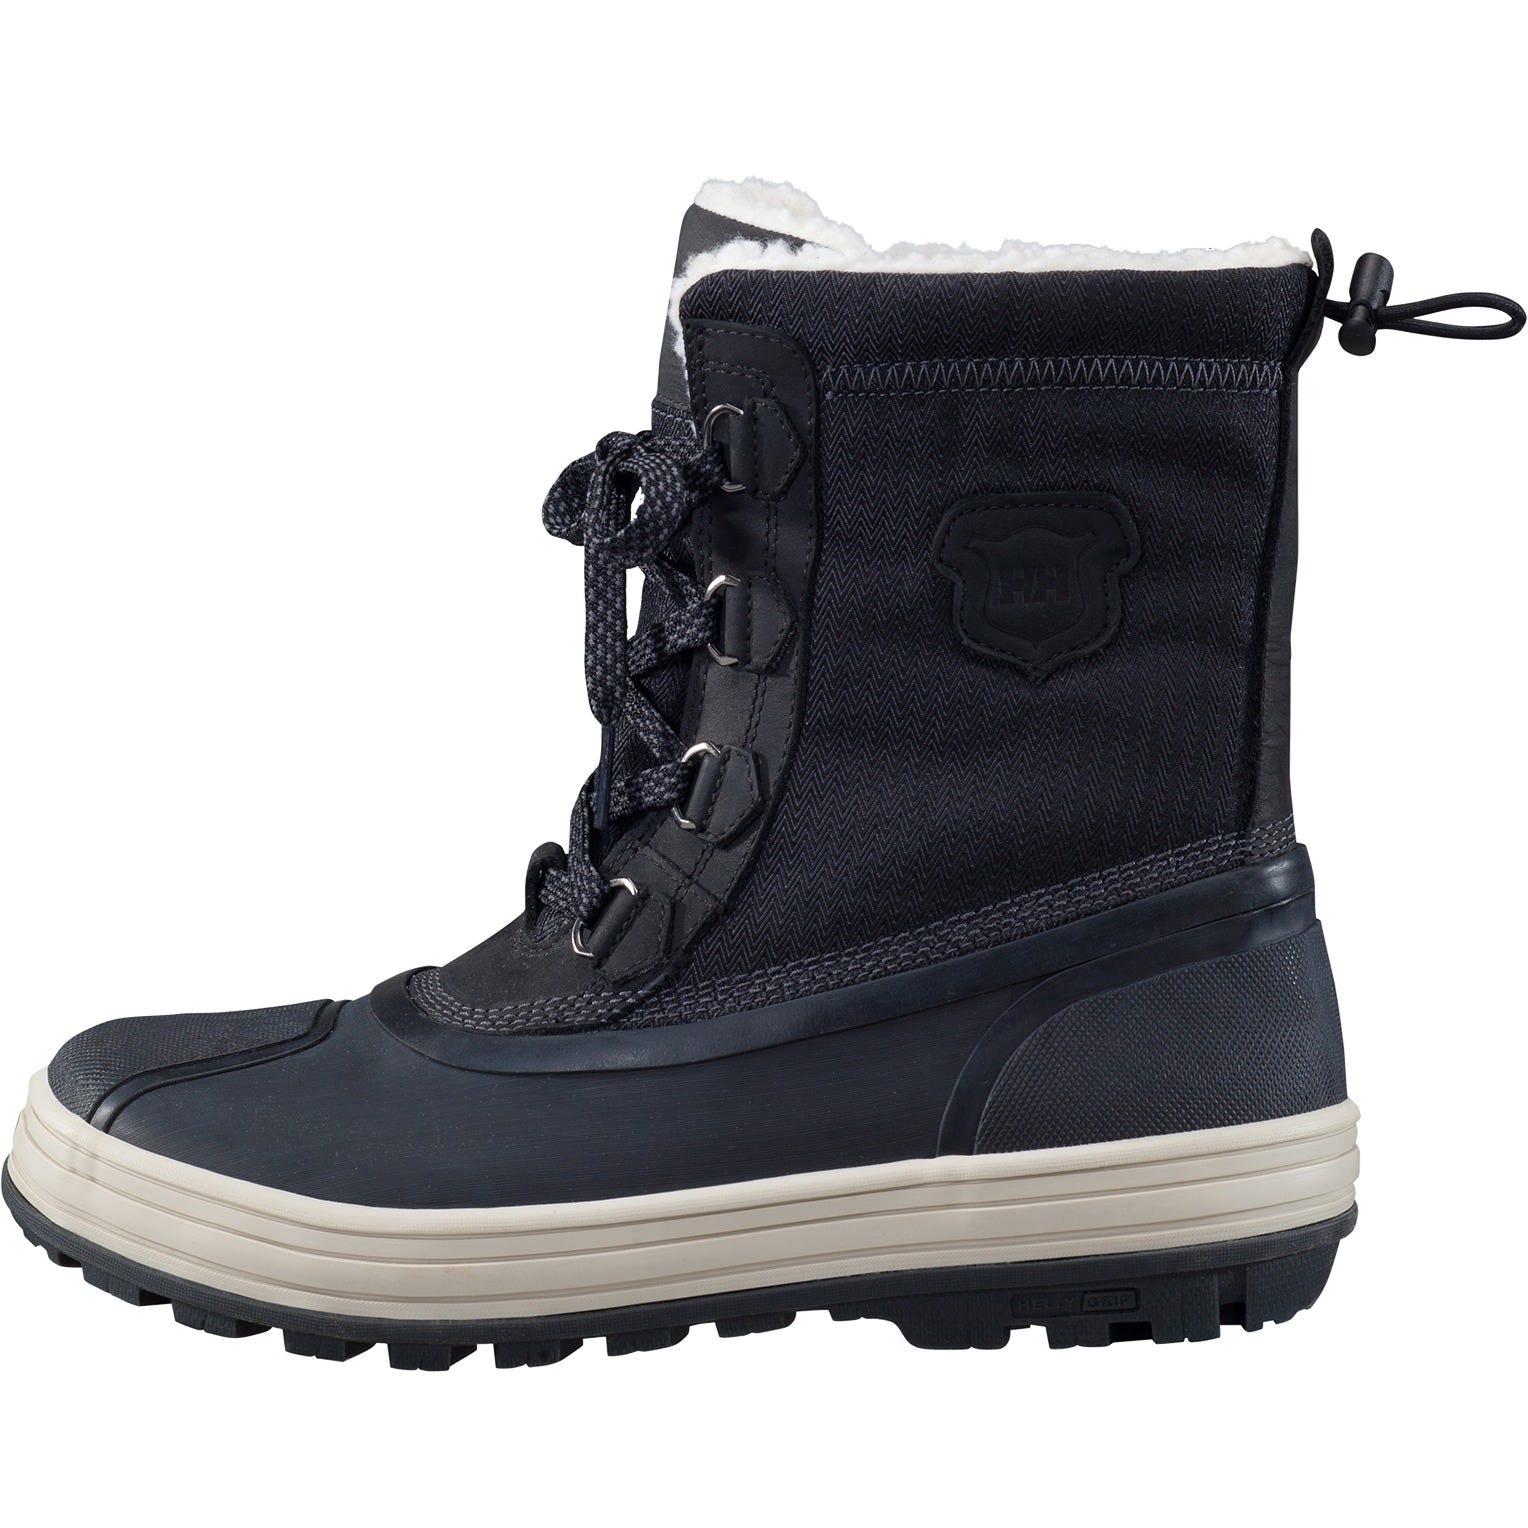 Helly Hansen W Framheim Womens Winter Boot Black 41/9